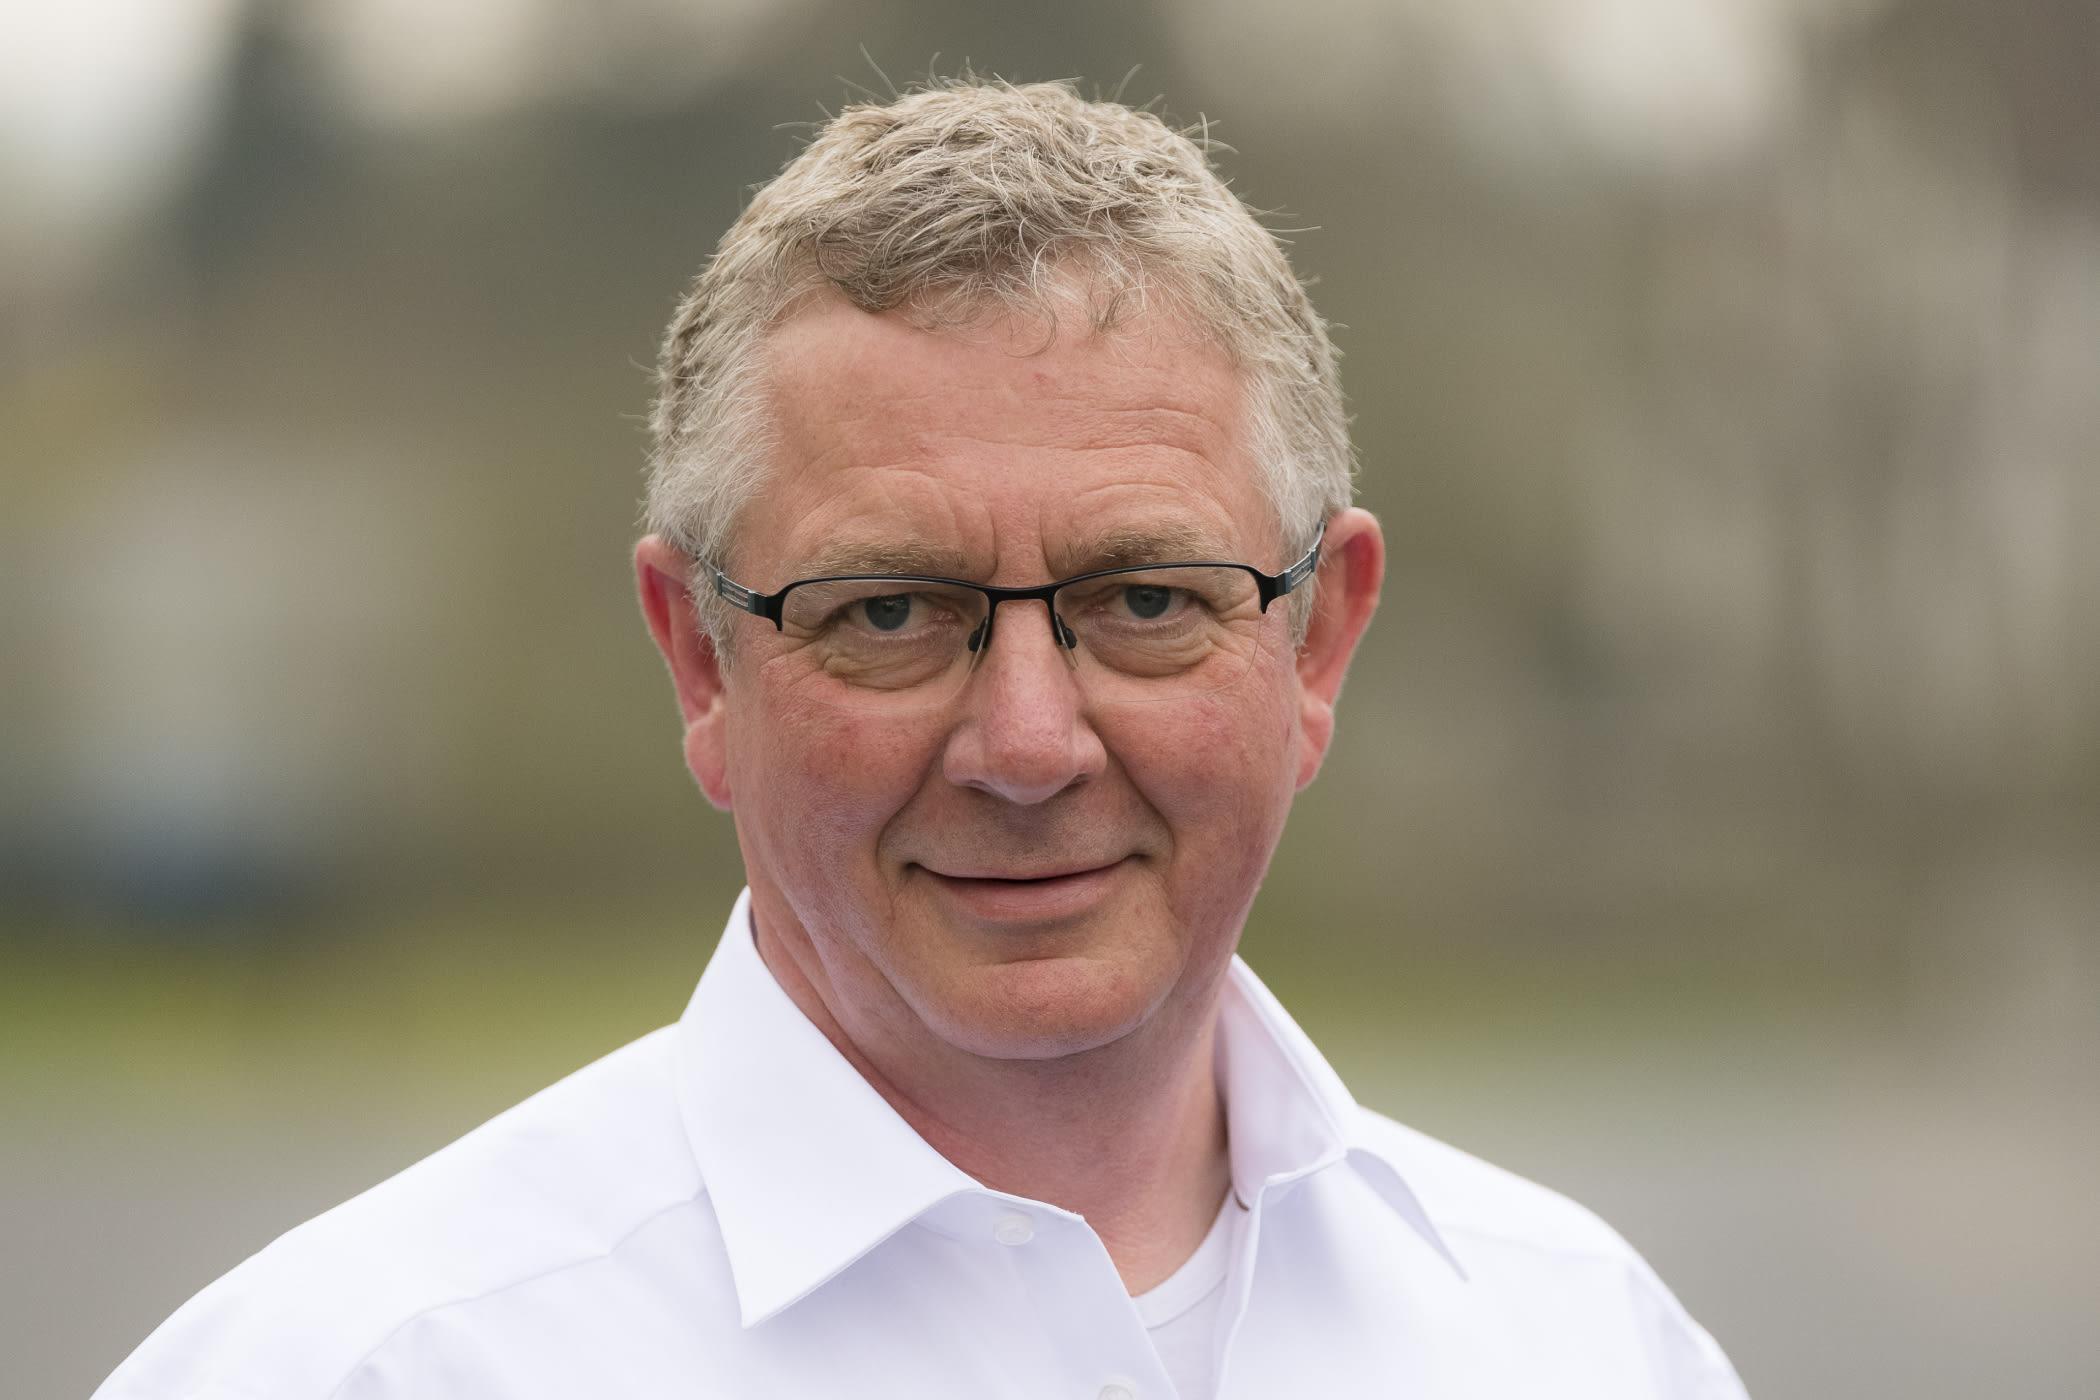 Wolfgang Wagner-Sachs neuer DMSB-Präsident